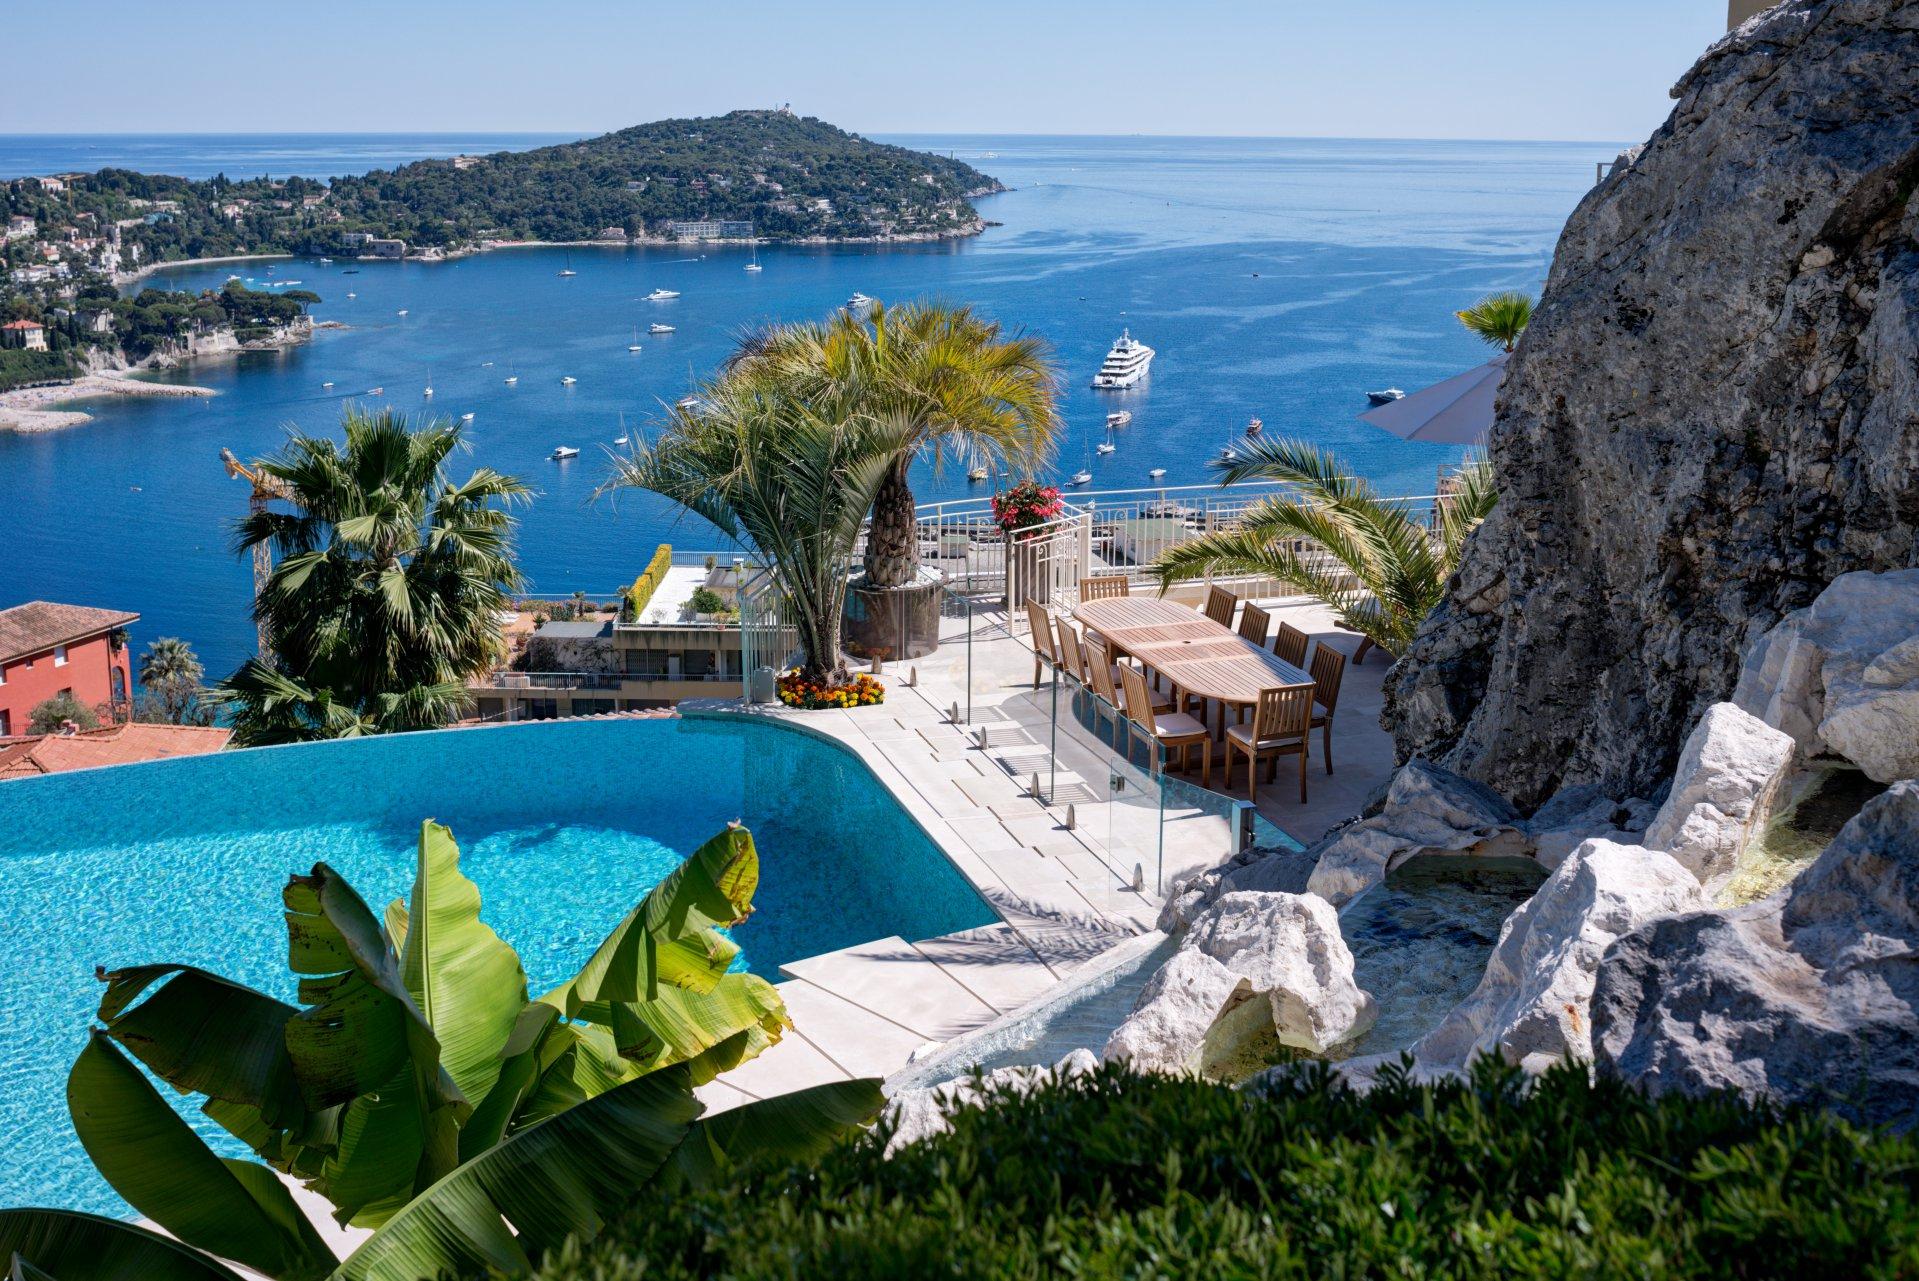 Ad Sale Property Villefranche Sur Mer 06230 8 Rooms Ref